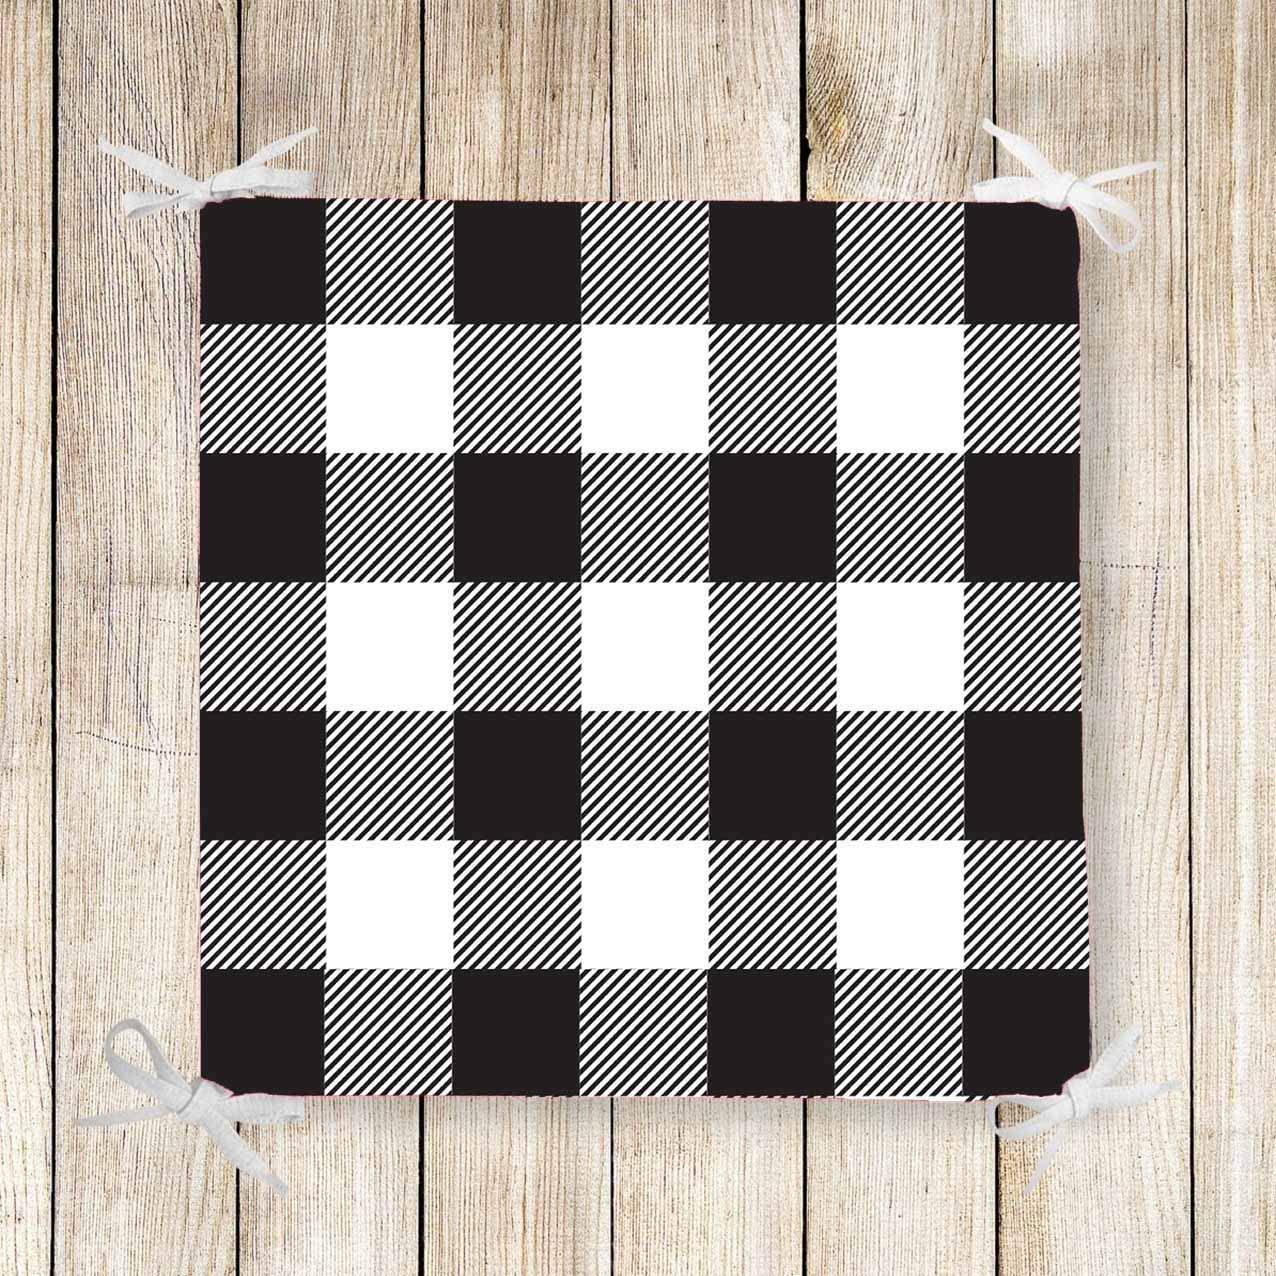 ELSE CARPET Buffalo Check Chair Pad Seat Cushion Softness Memory Foam Full Lenght Ties Non Slip Washable Zipper, Black & White